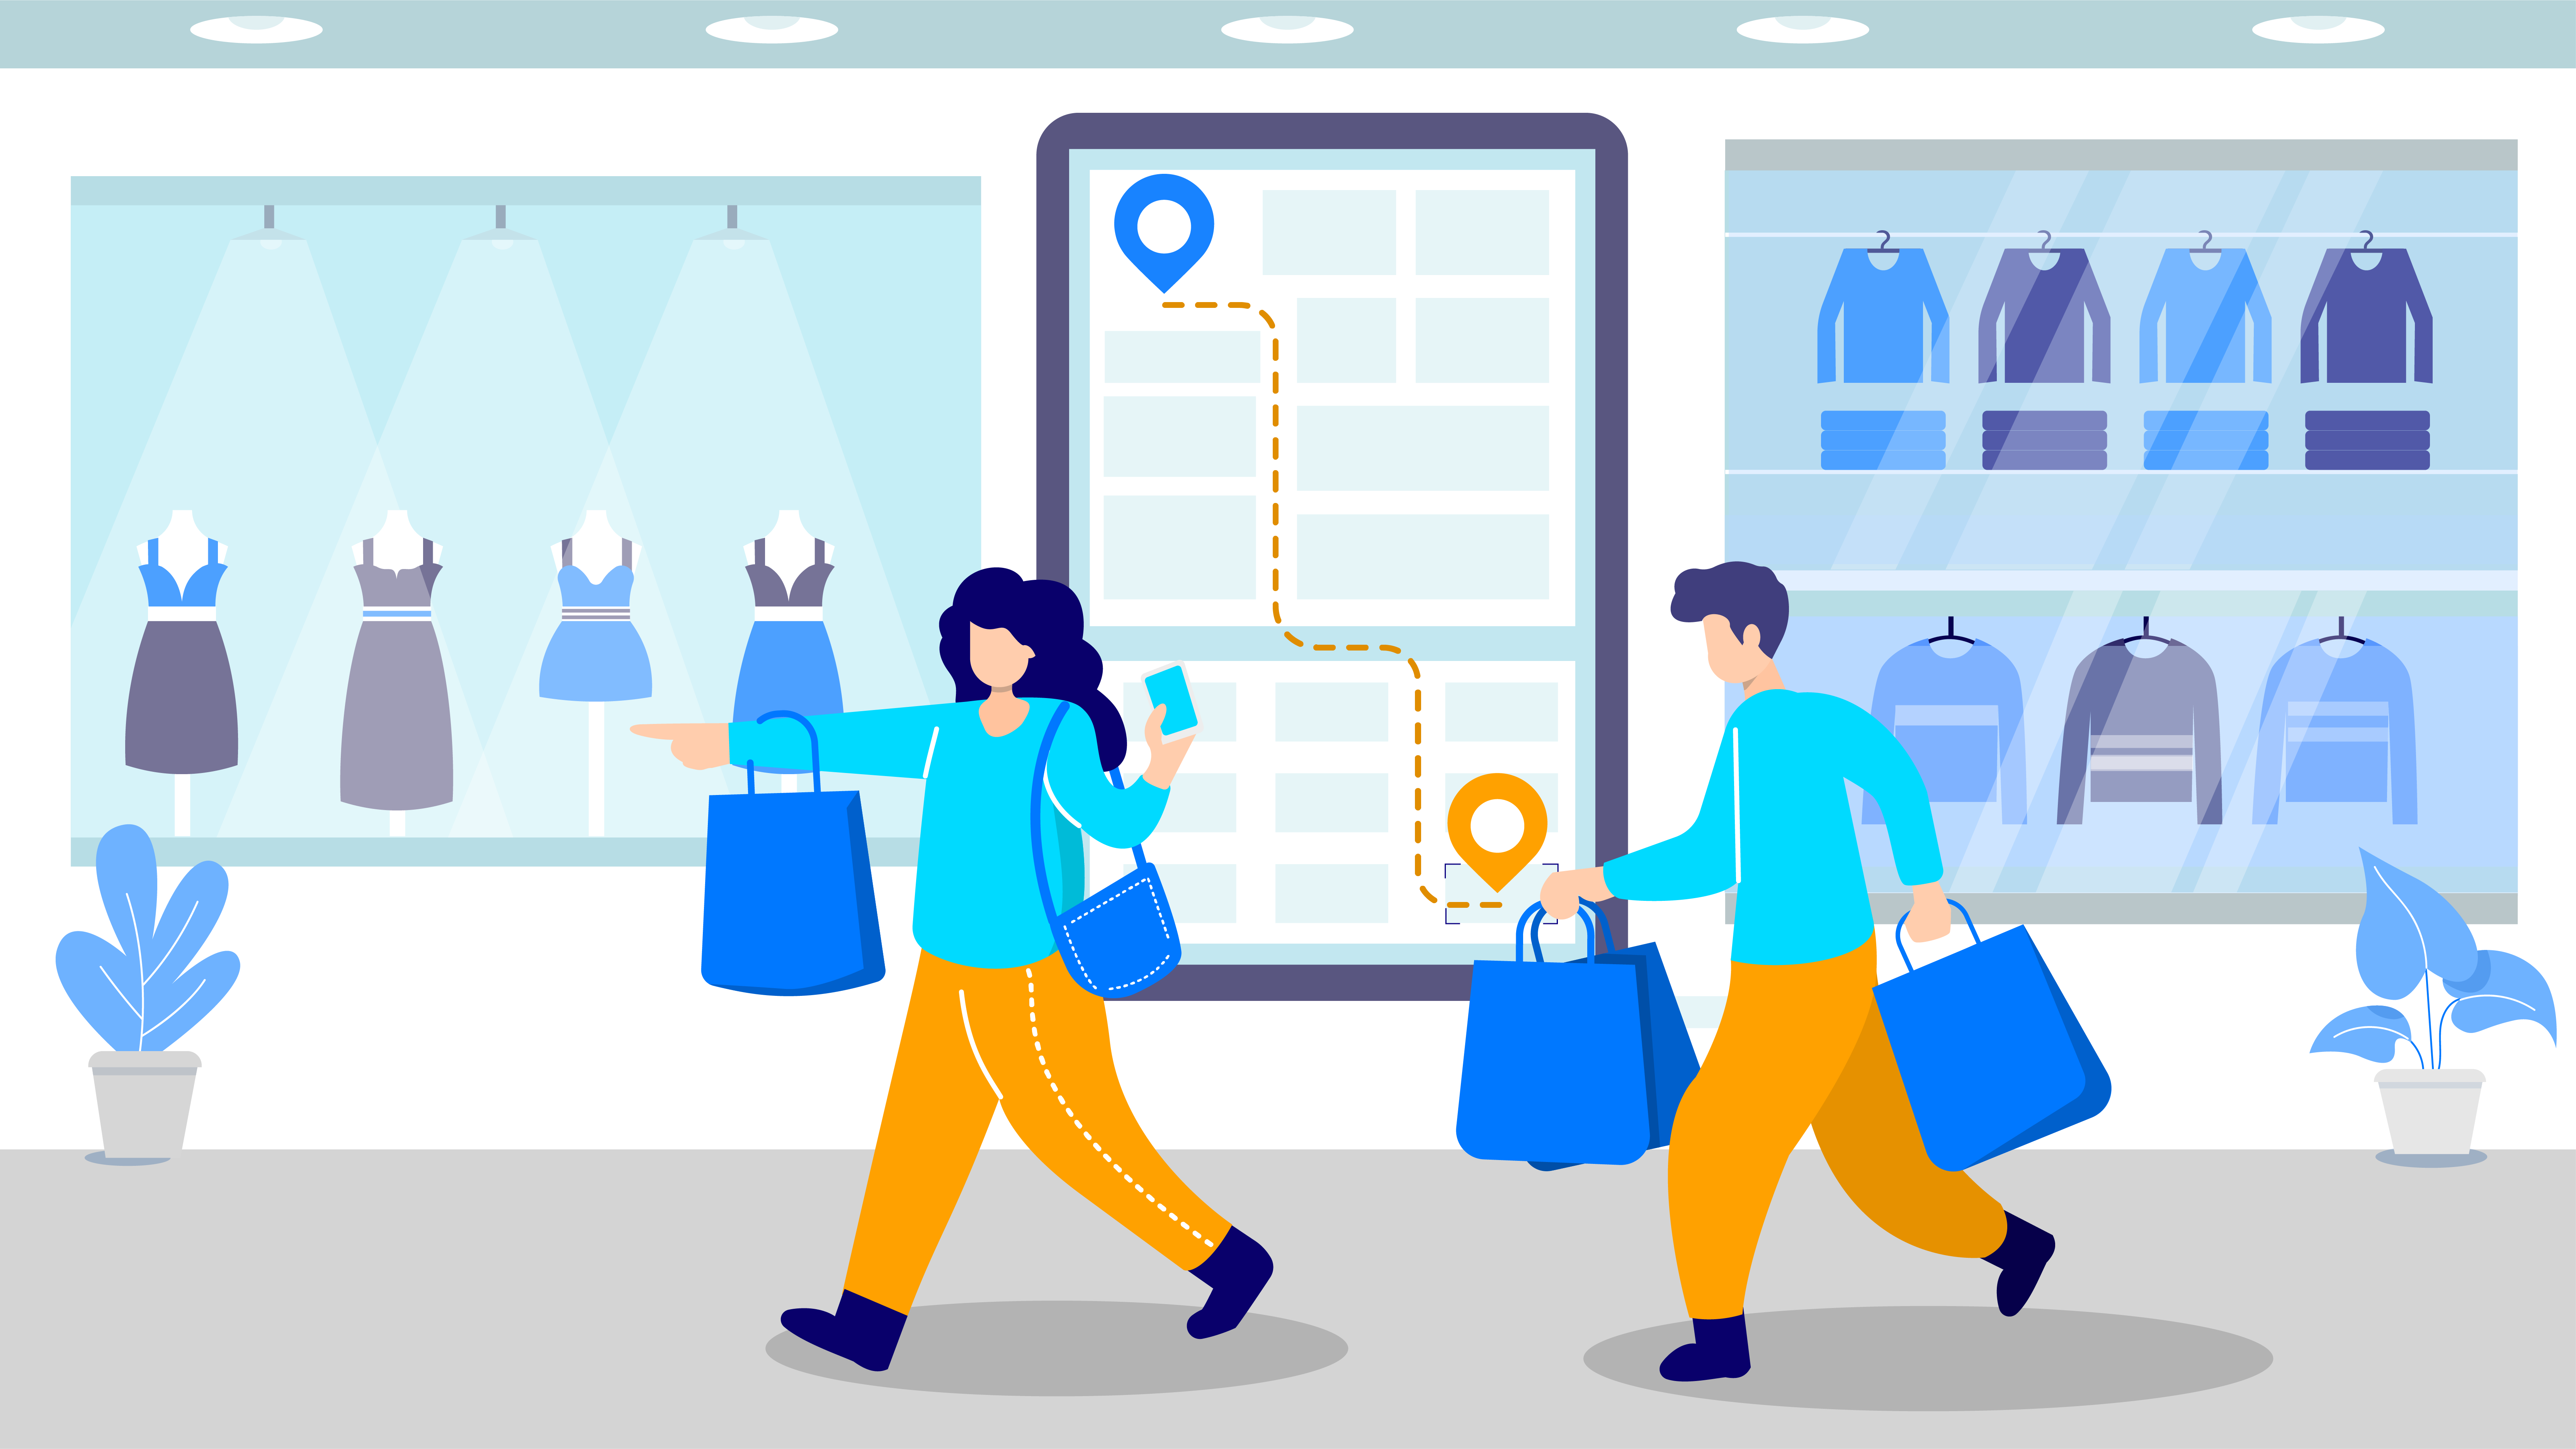 indoor navigation in shopping malls